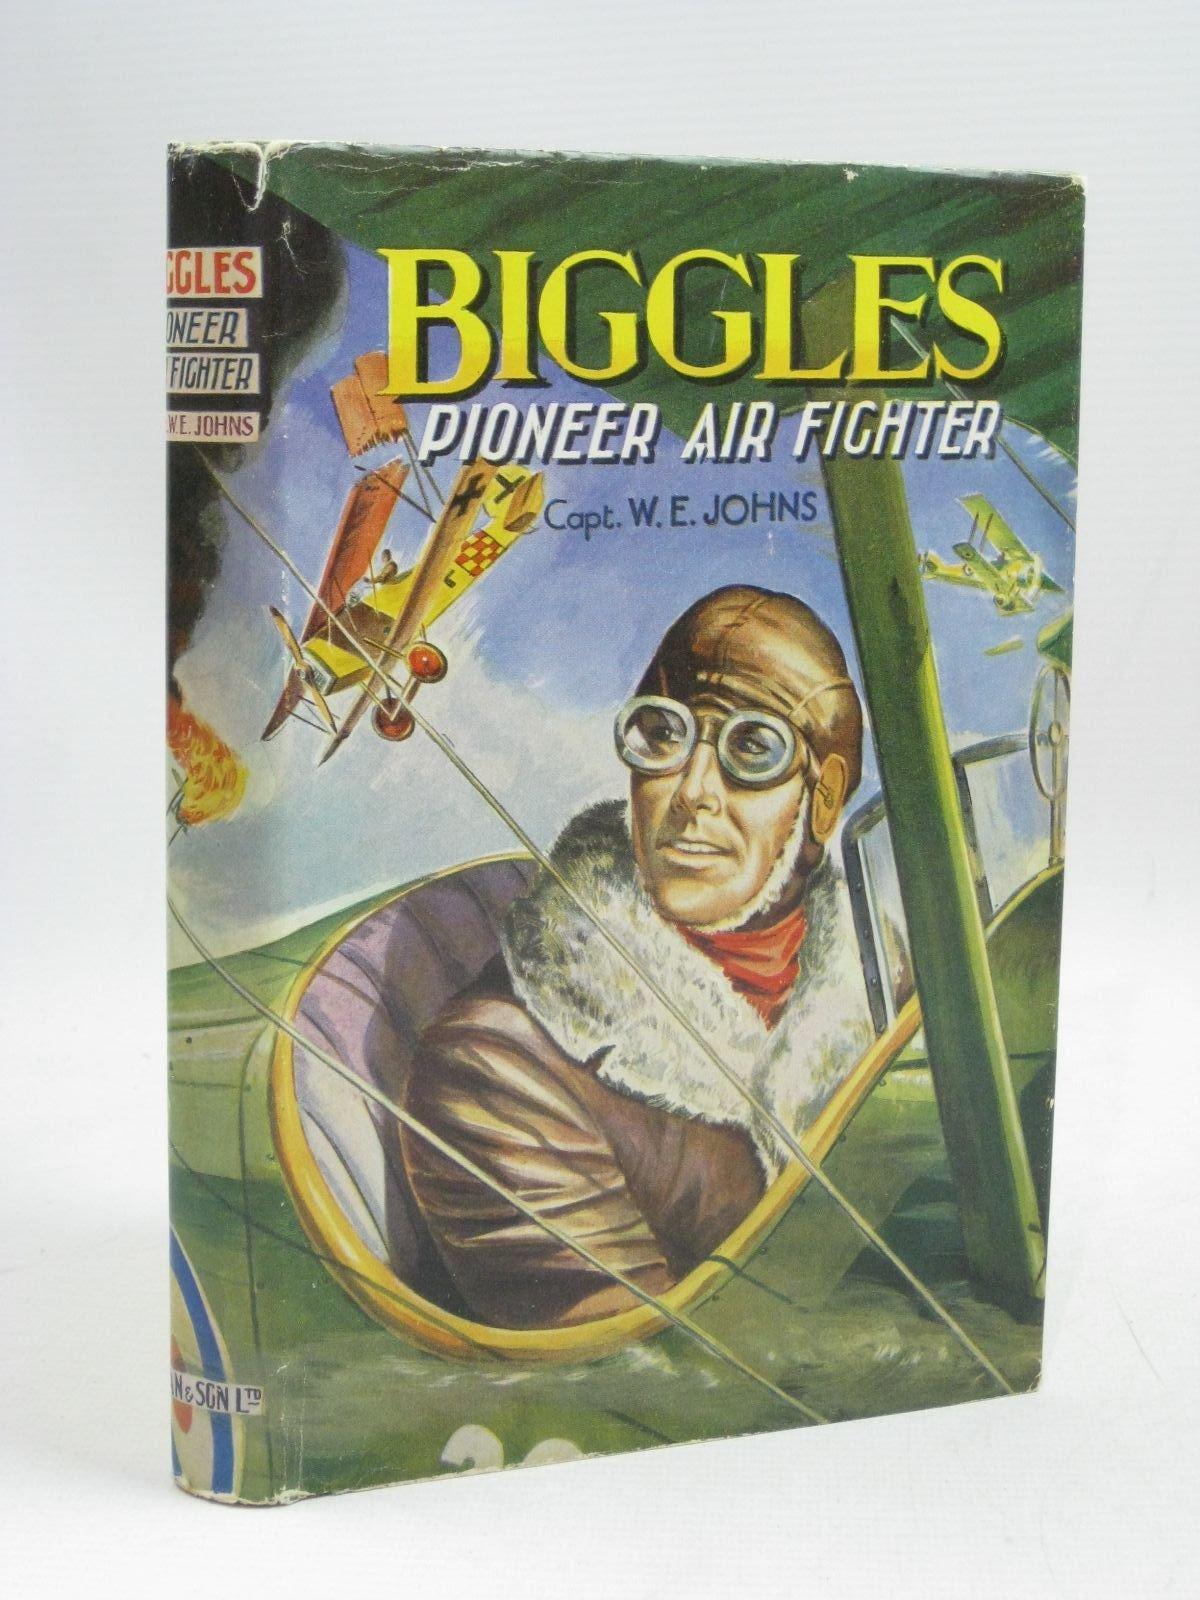 BIGGLES PIONEER AIR FIGHTER: Amazon.co.uk: W.E. Johns: 9780603034053: Books